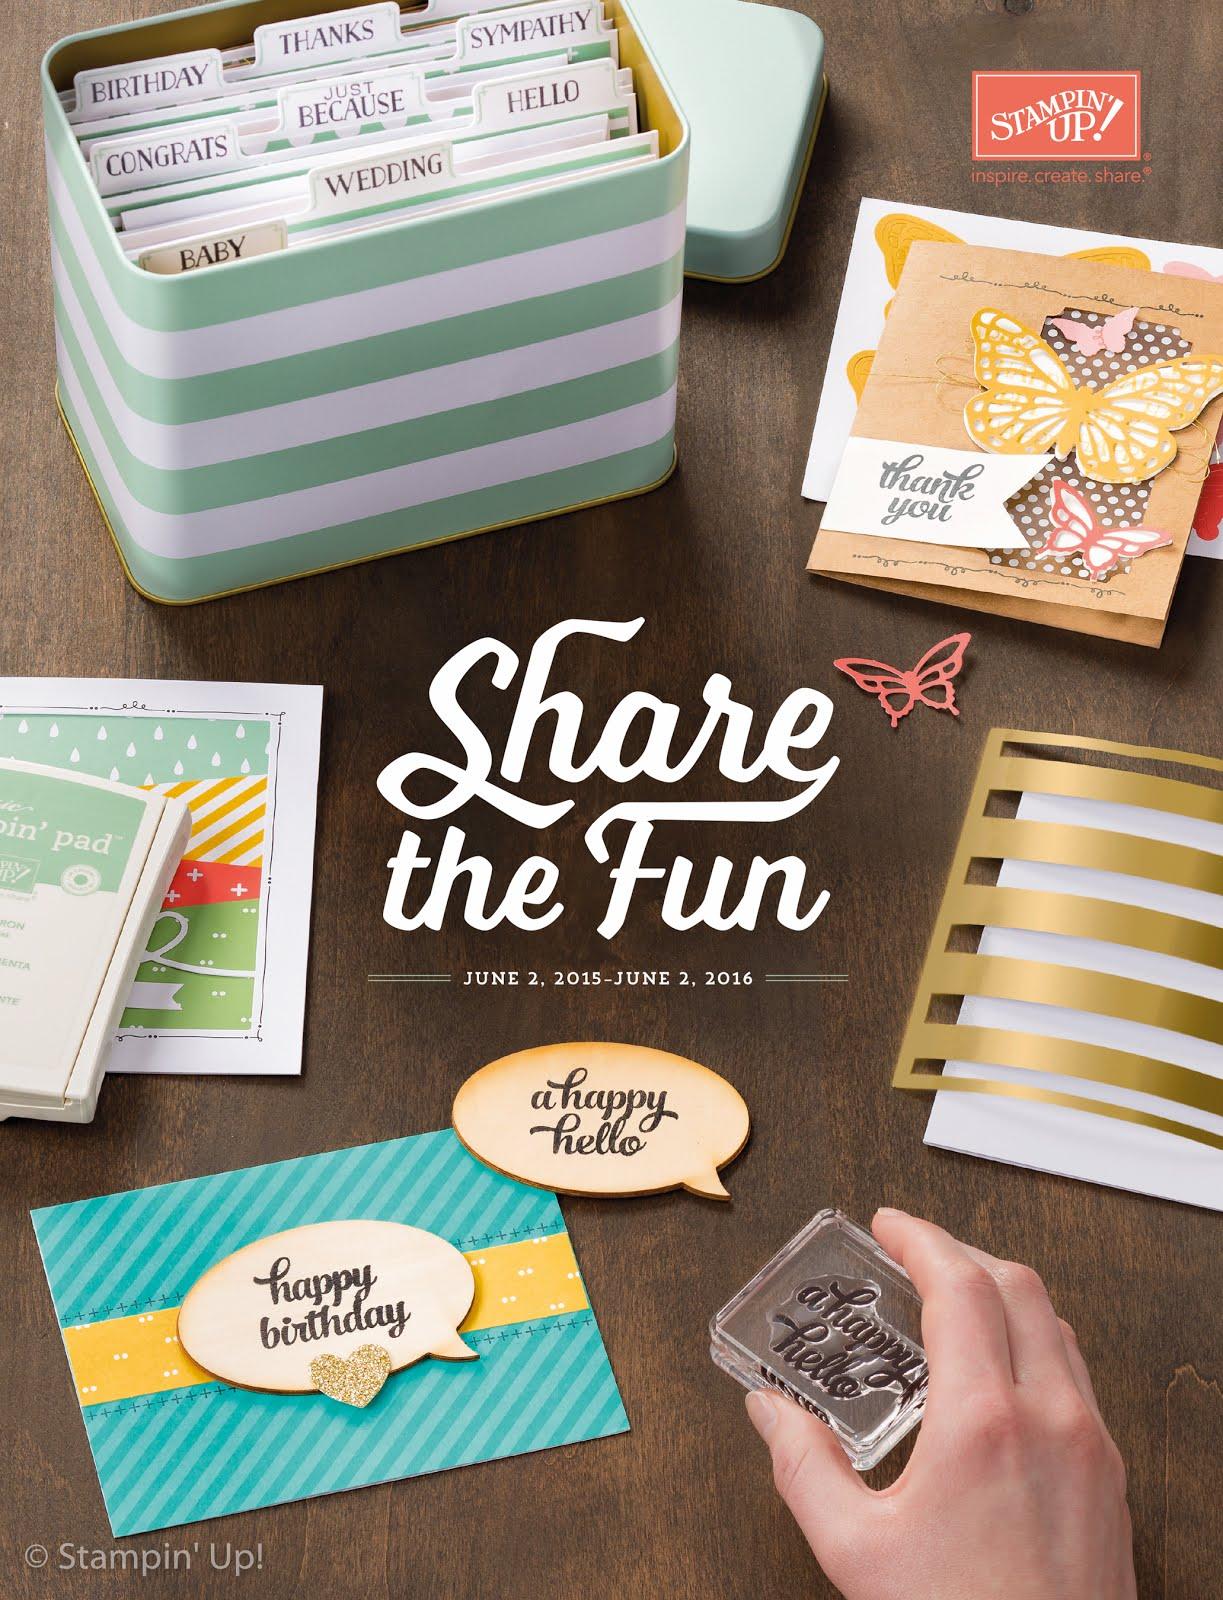 2015-2016 Stampin' Up! Catalogue